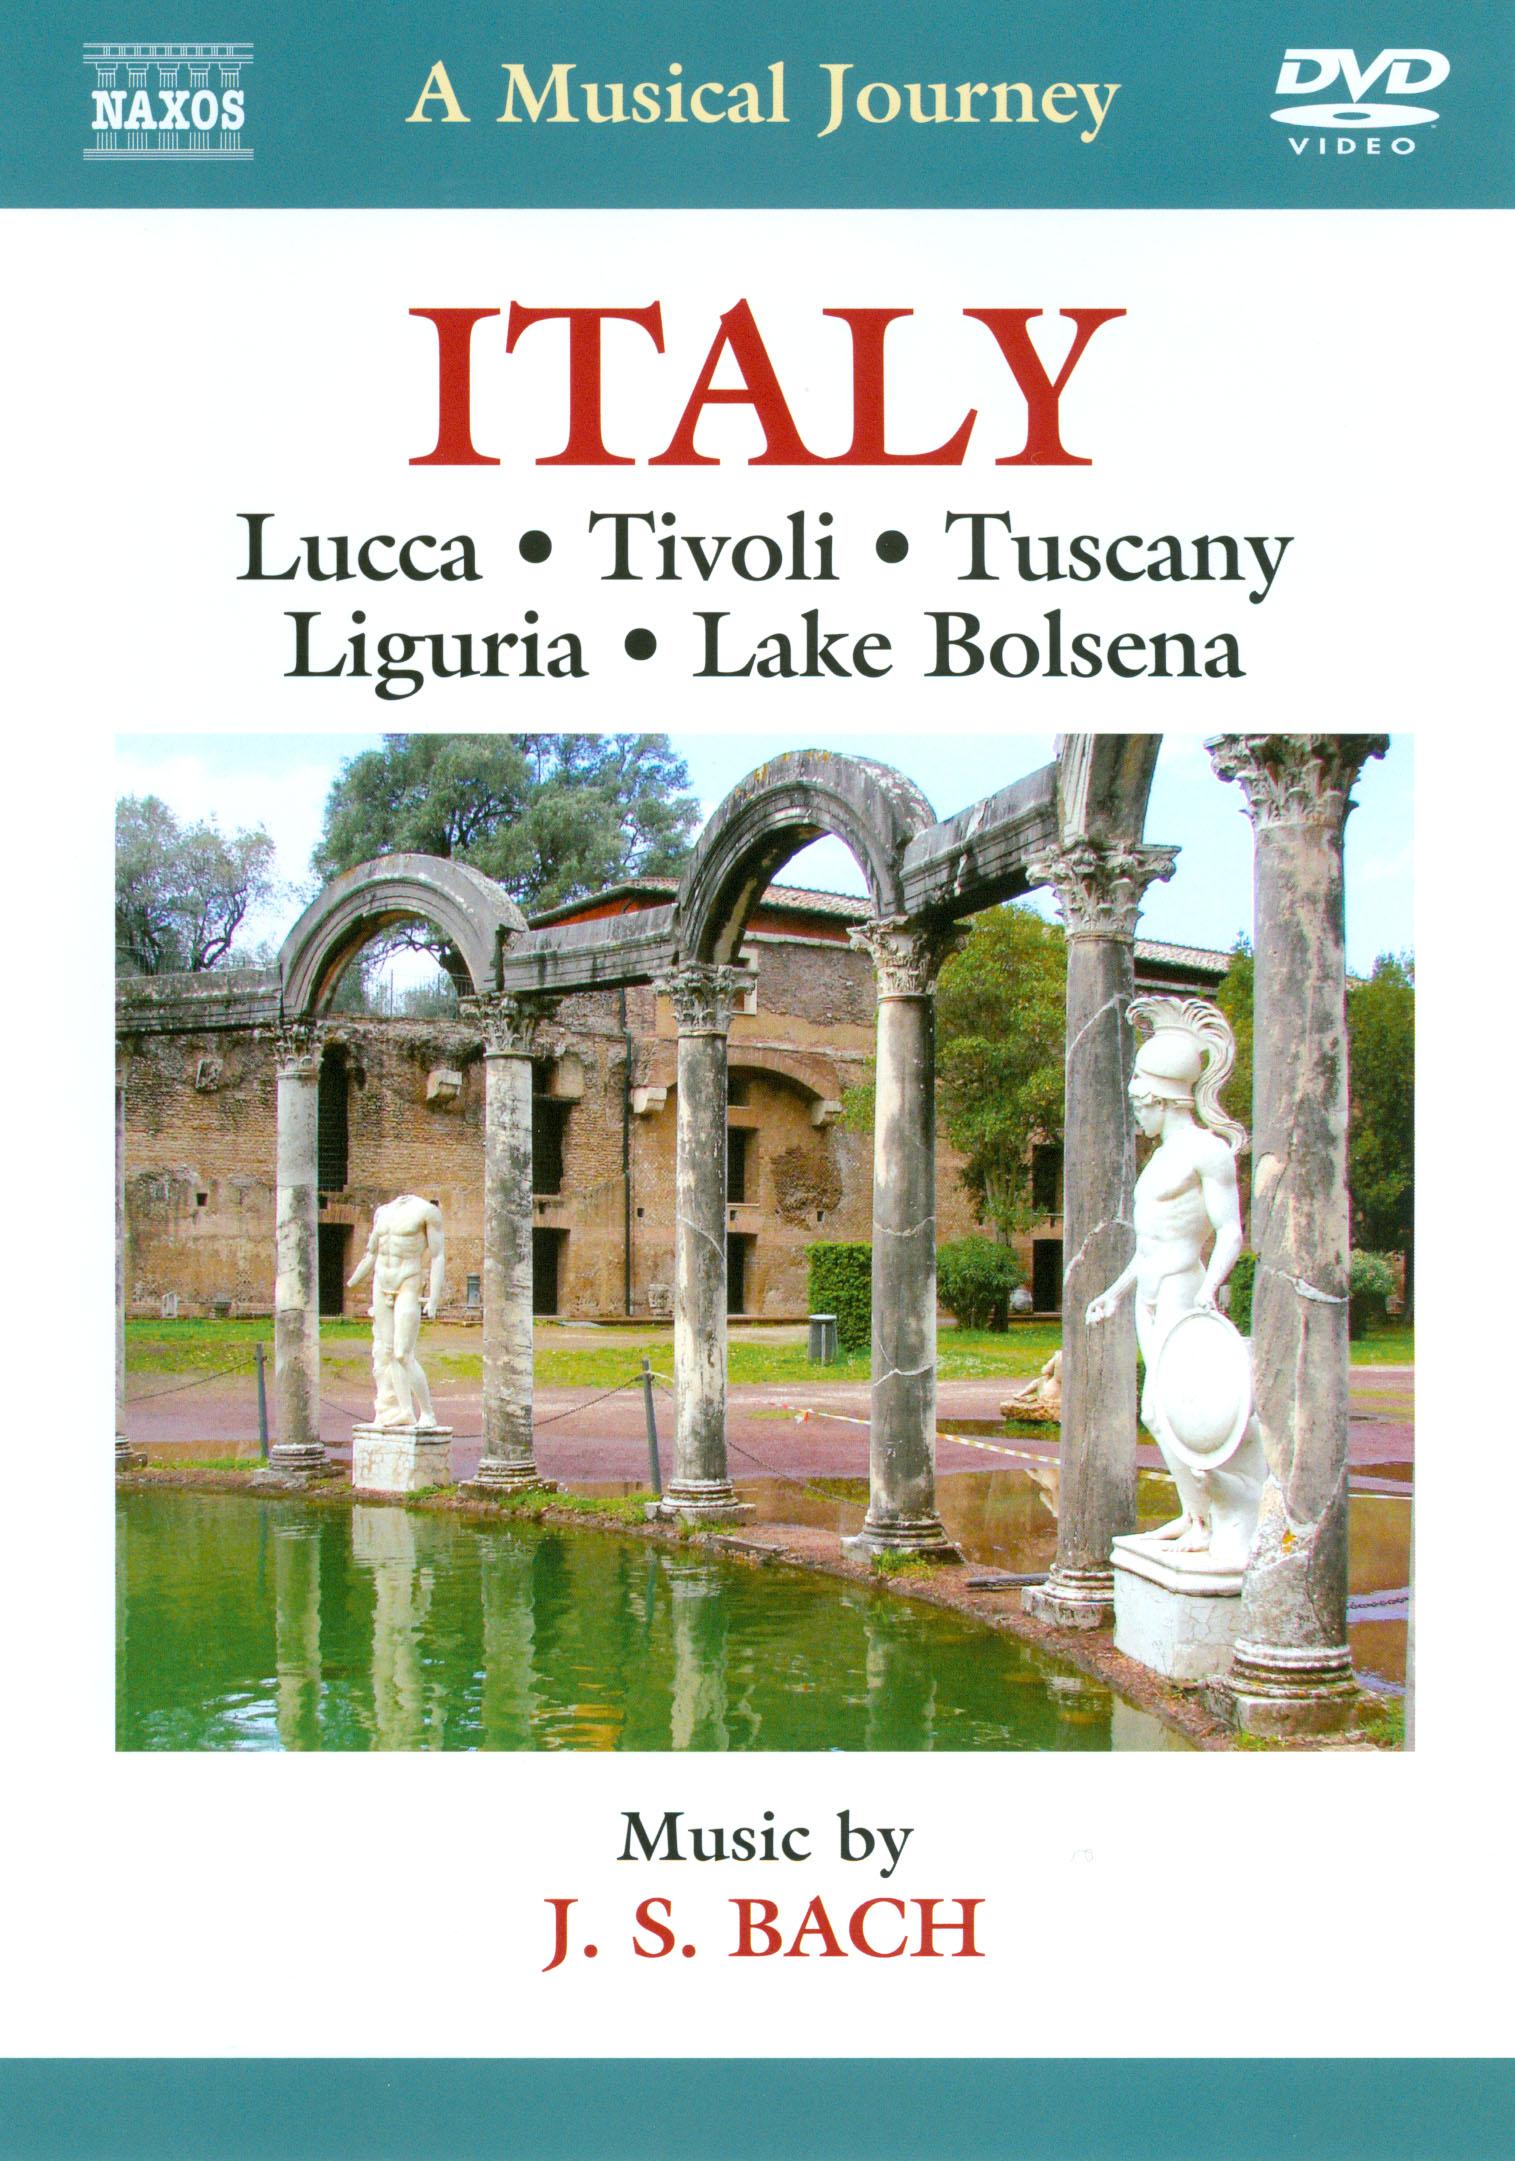 A Musical Journey: Italy - Lucca/Tivoli/Tuscany/Liguria/Lake Bolsena